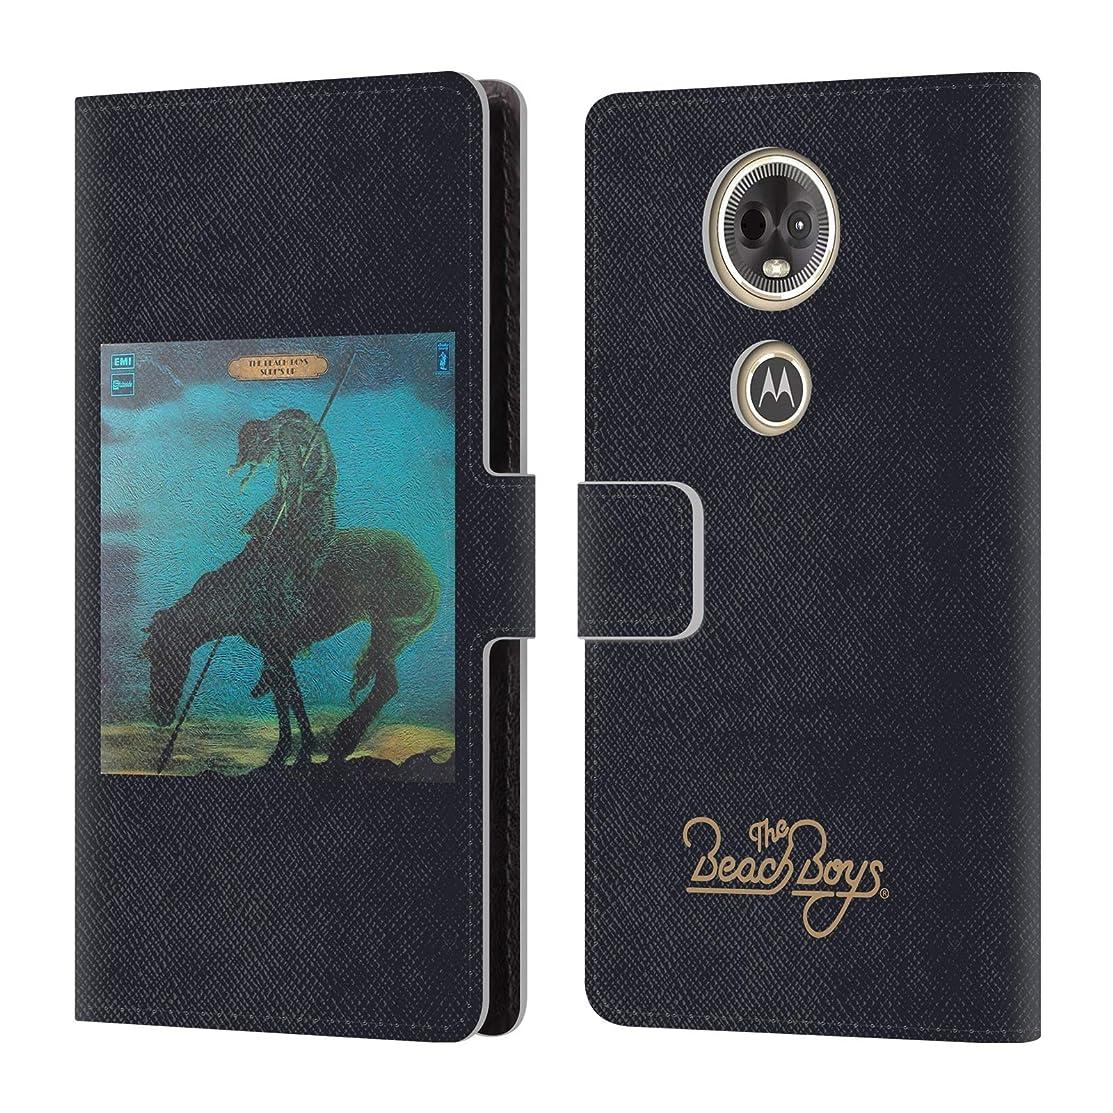 Official The Beach Boys Surfs Up Album Cover Art Leather Book Wallet Case Cover for Motorola Moto E5 Plus